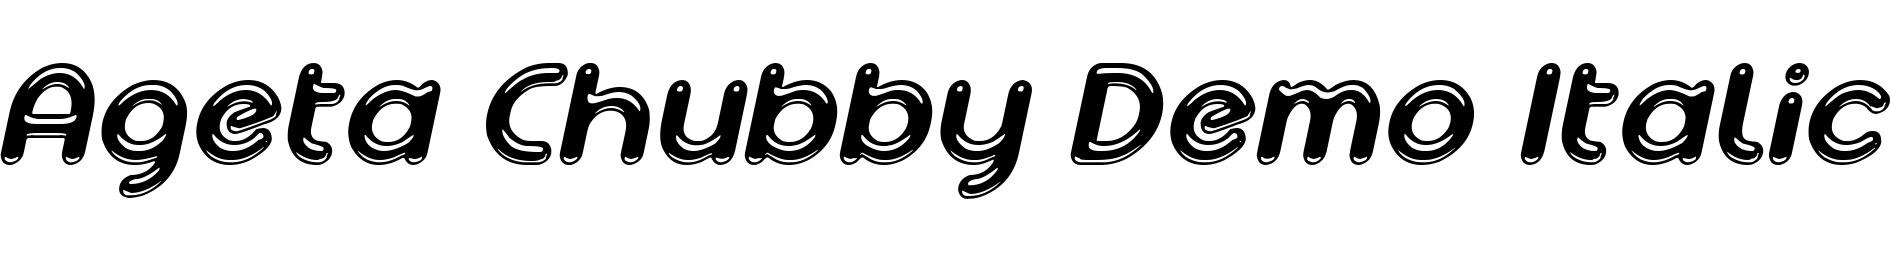 Ageta Chubby Demo Italic